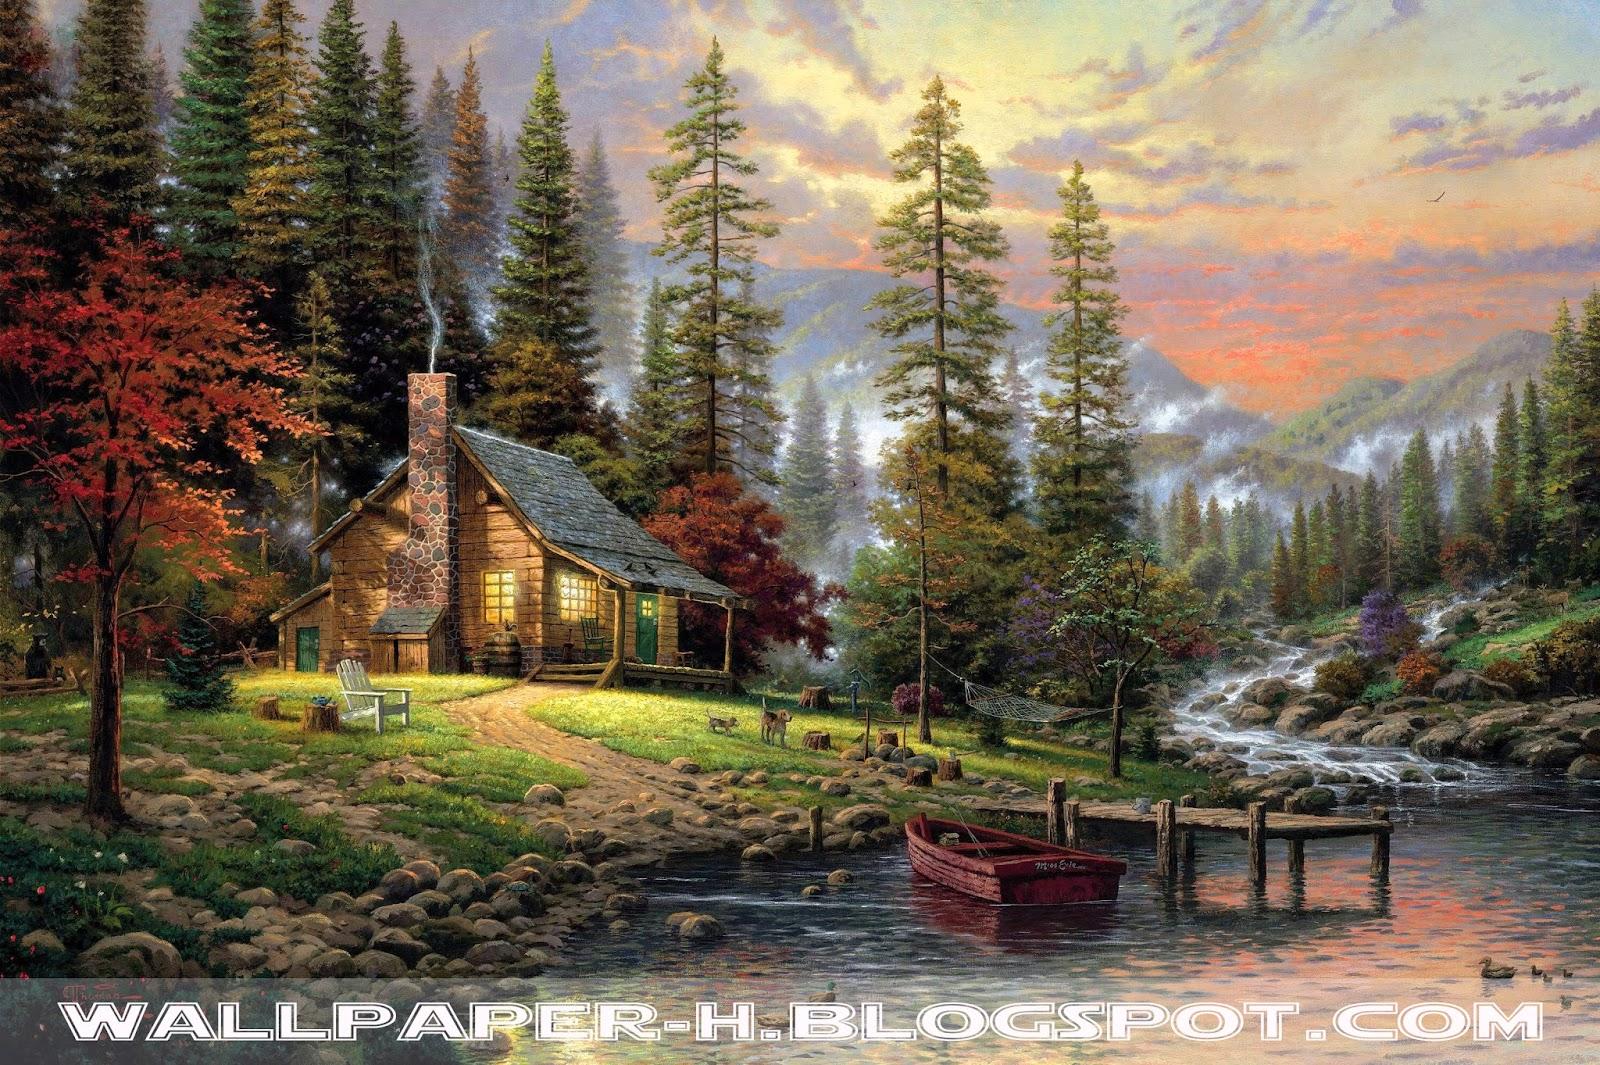 Thomas_Kinkade_a_quiet_cozy_home_chair_barrel_fiber_dogs_gomak